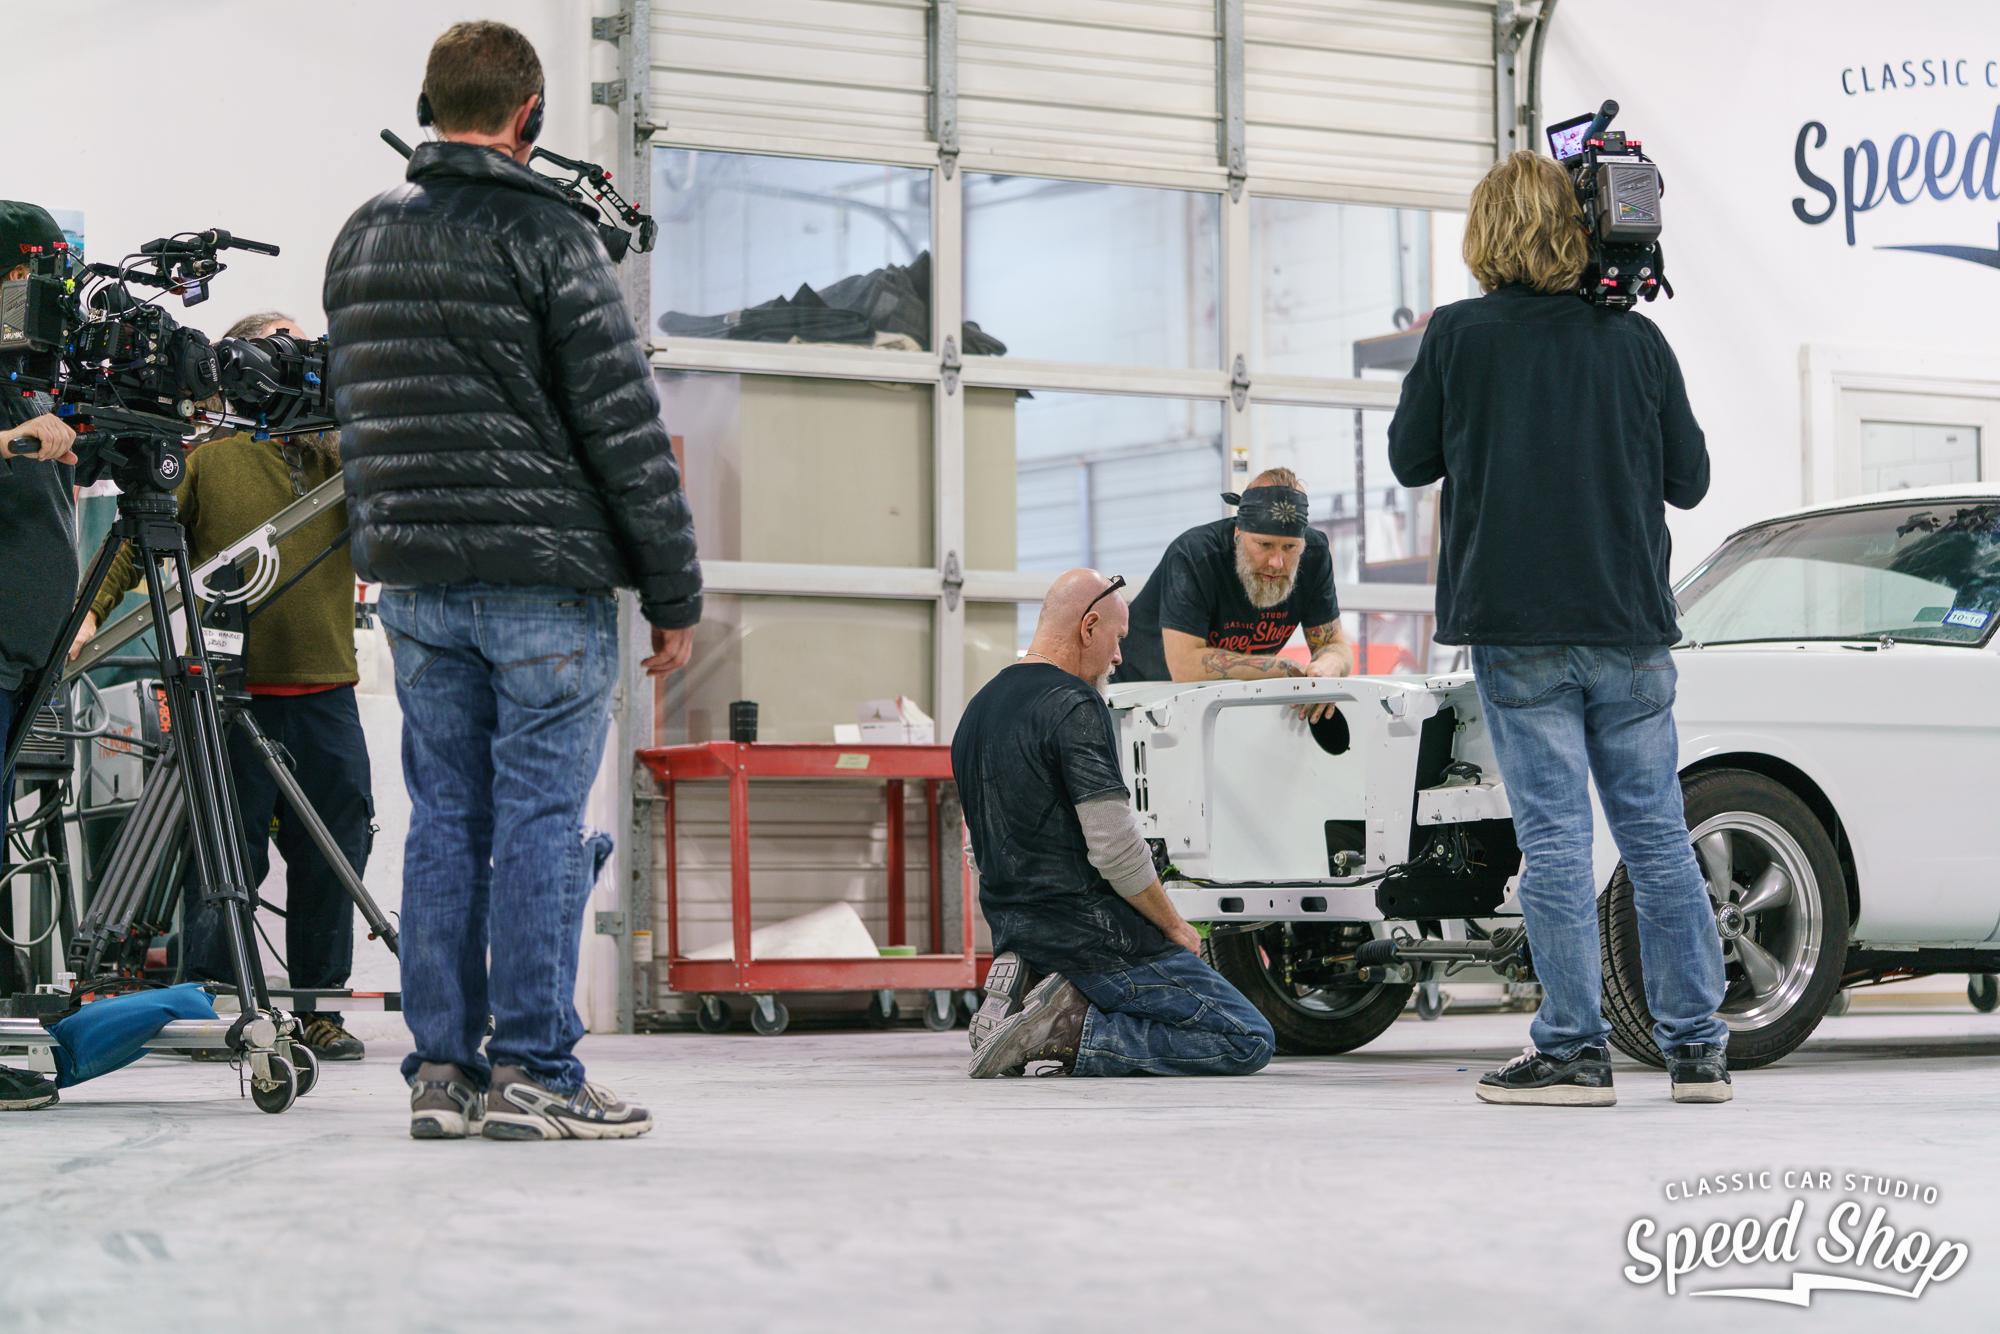 behind the scenes of shooting Classic Car Studio